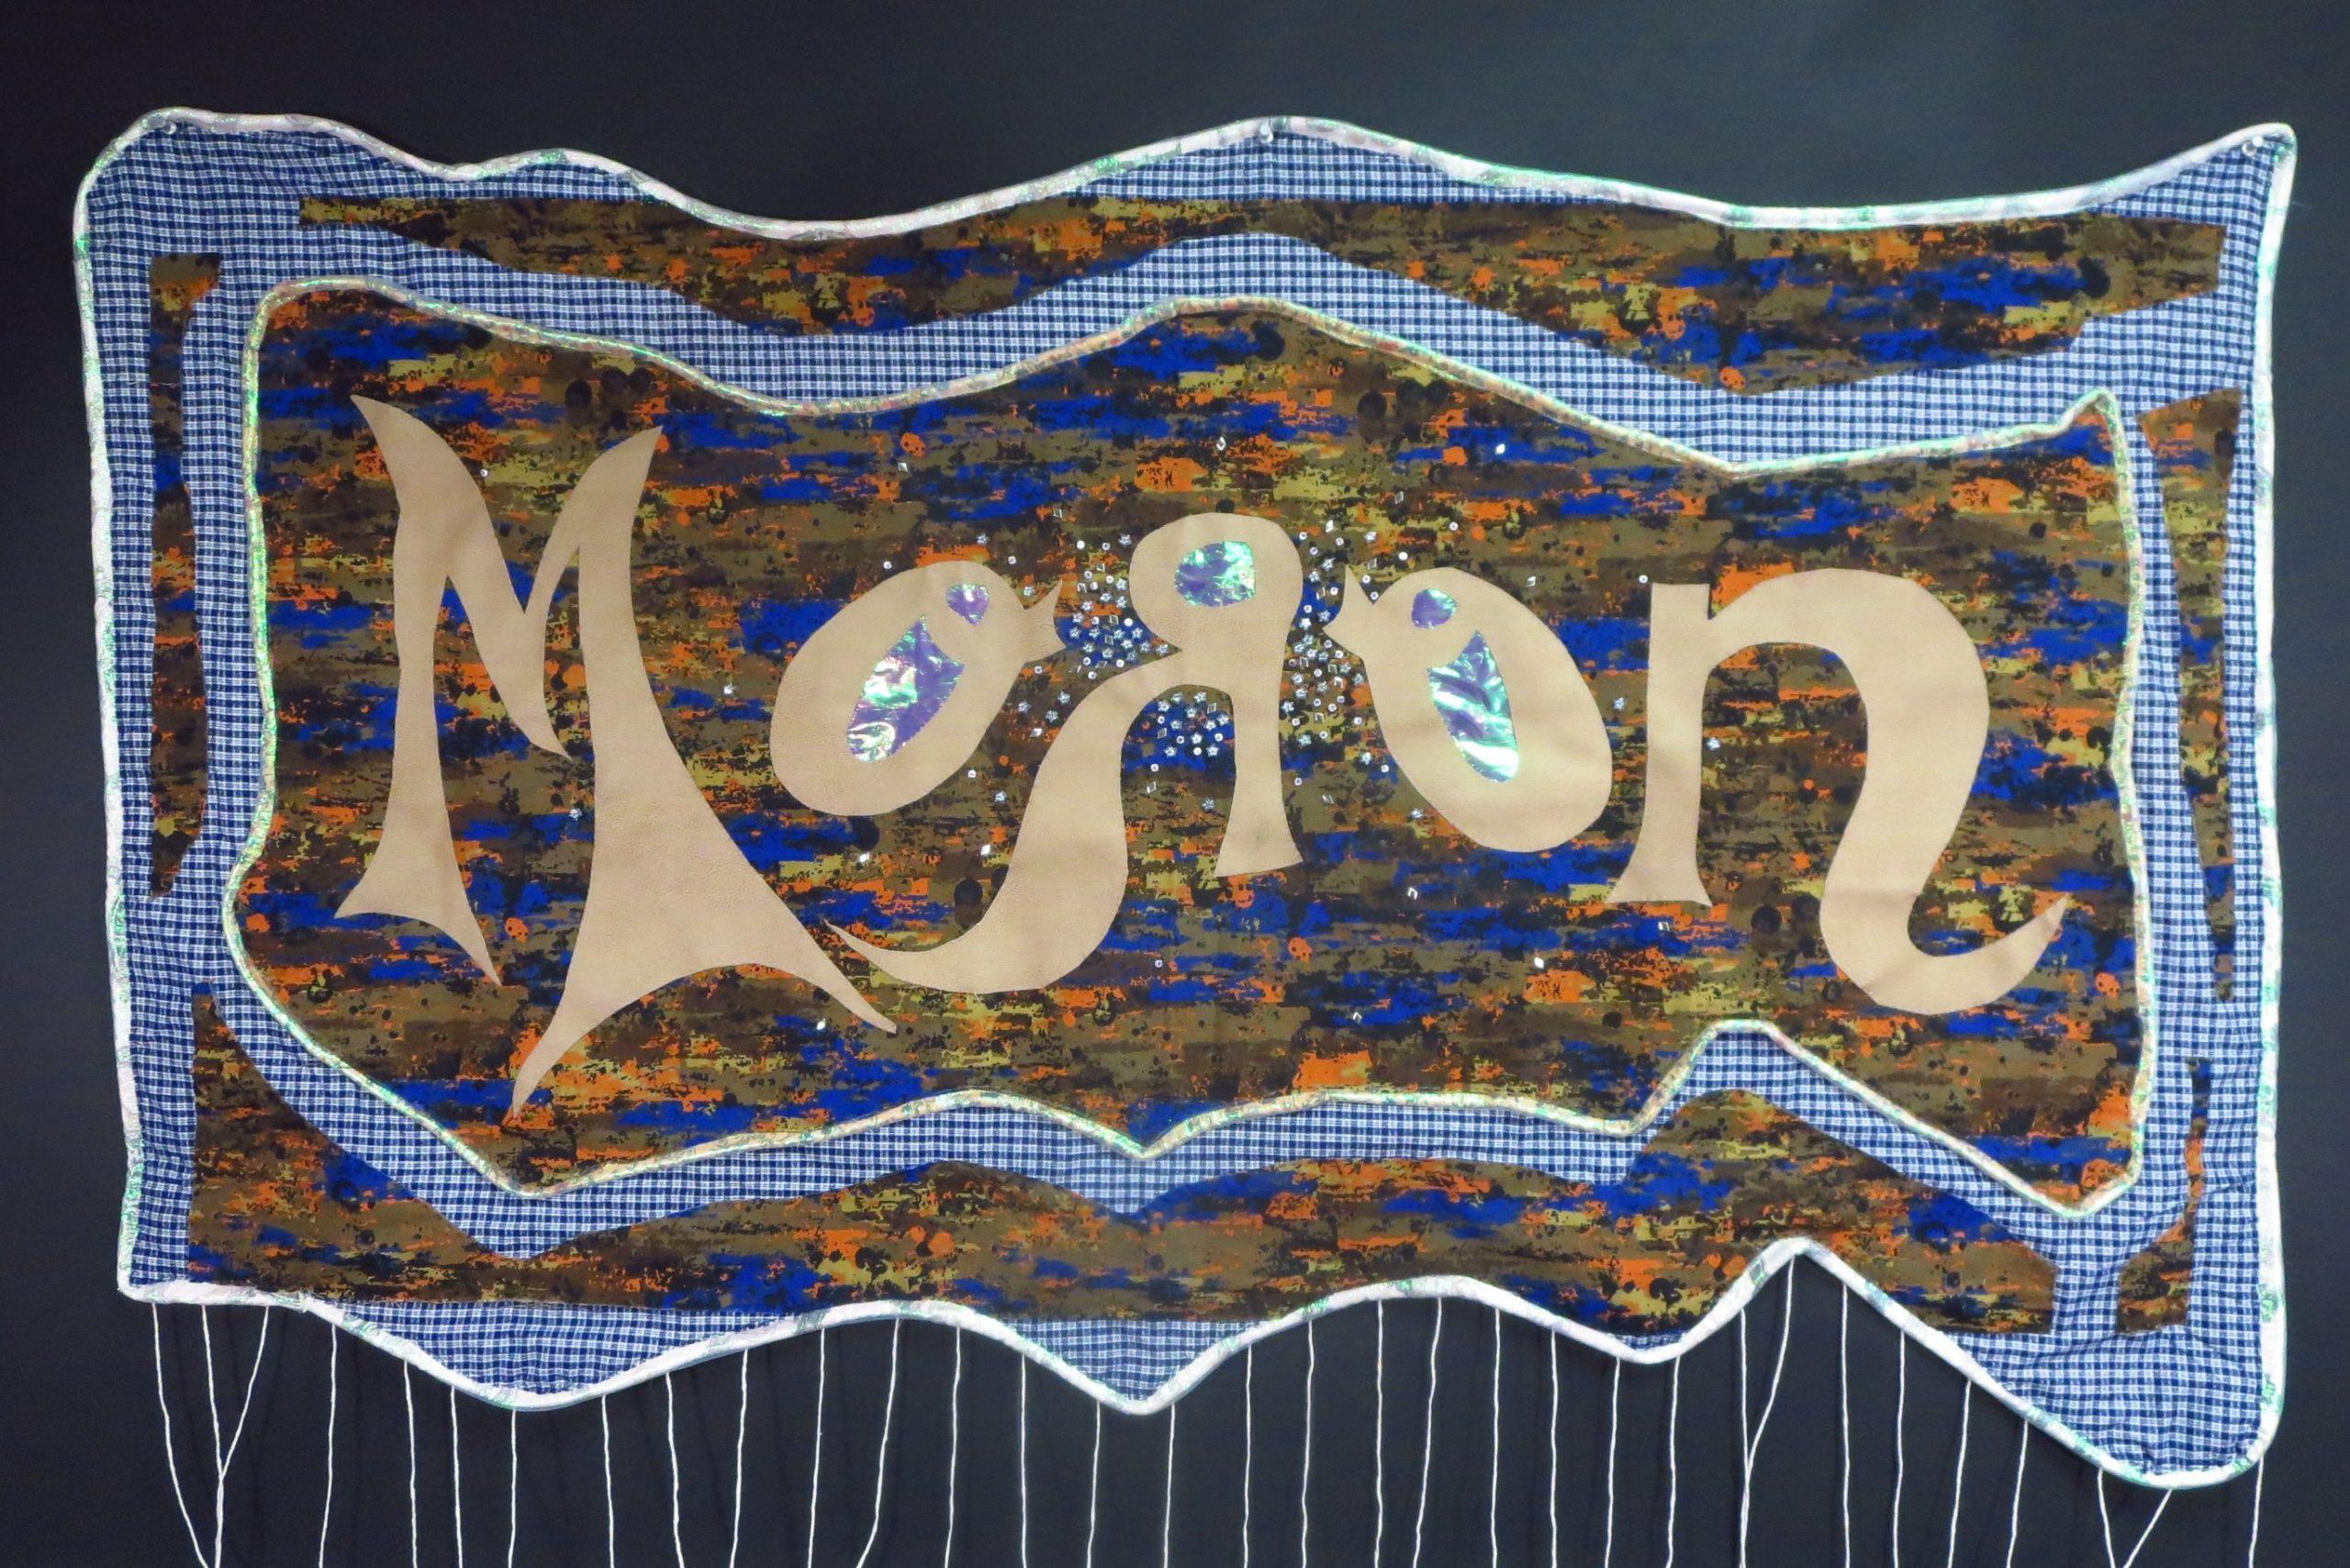 4 (Fucking) Moron - hand sewn fabrics - aapprox 28 x 53